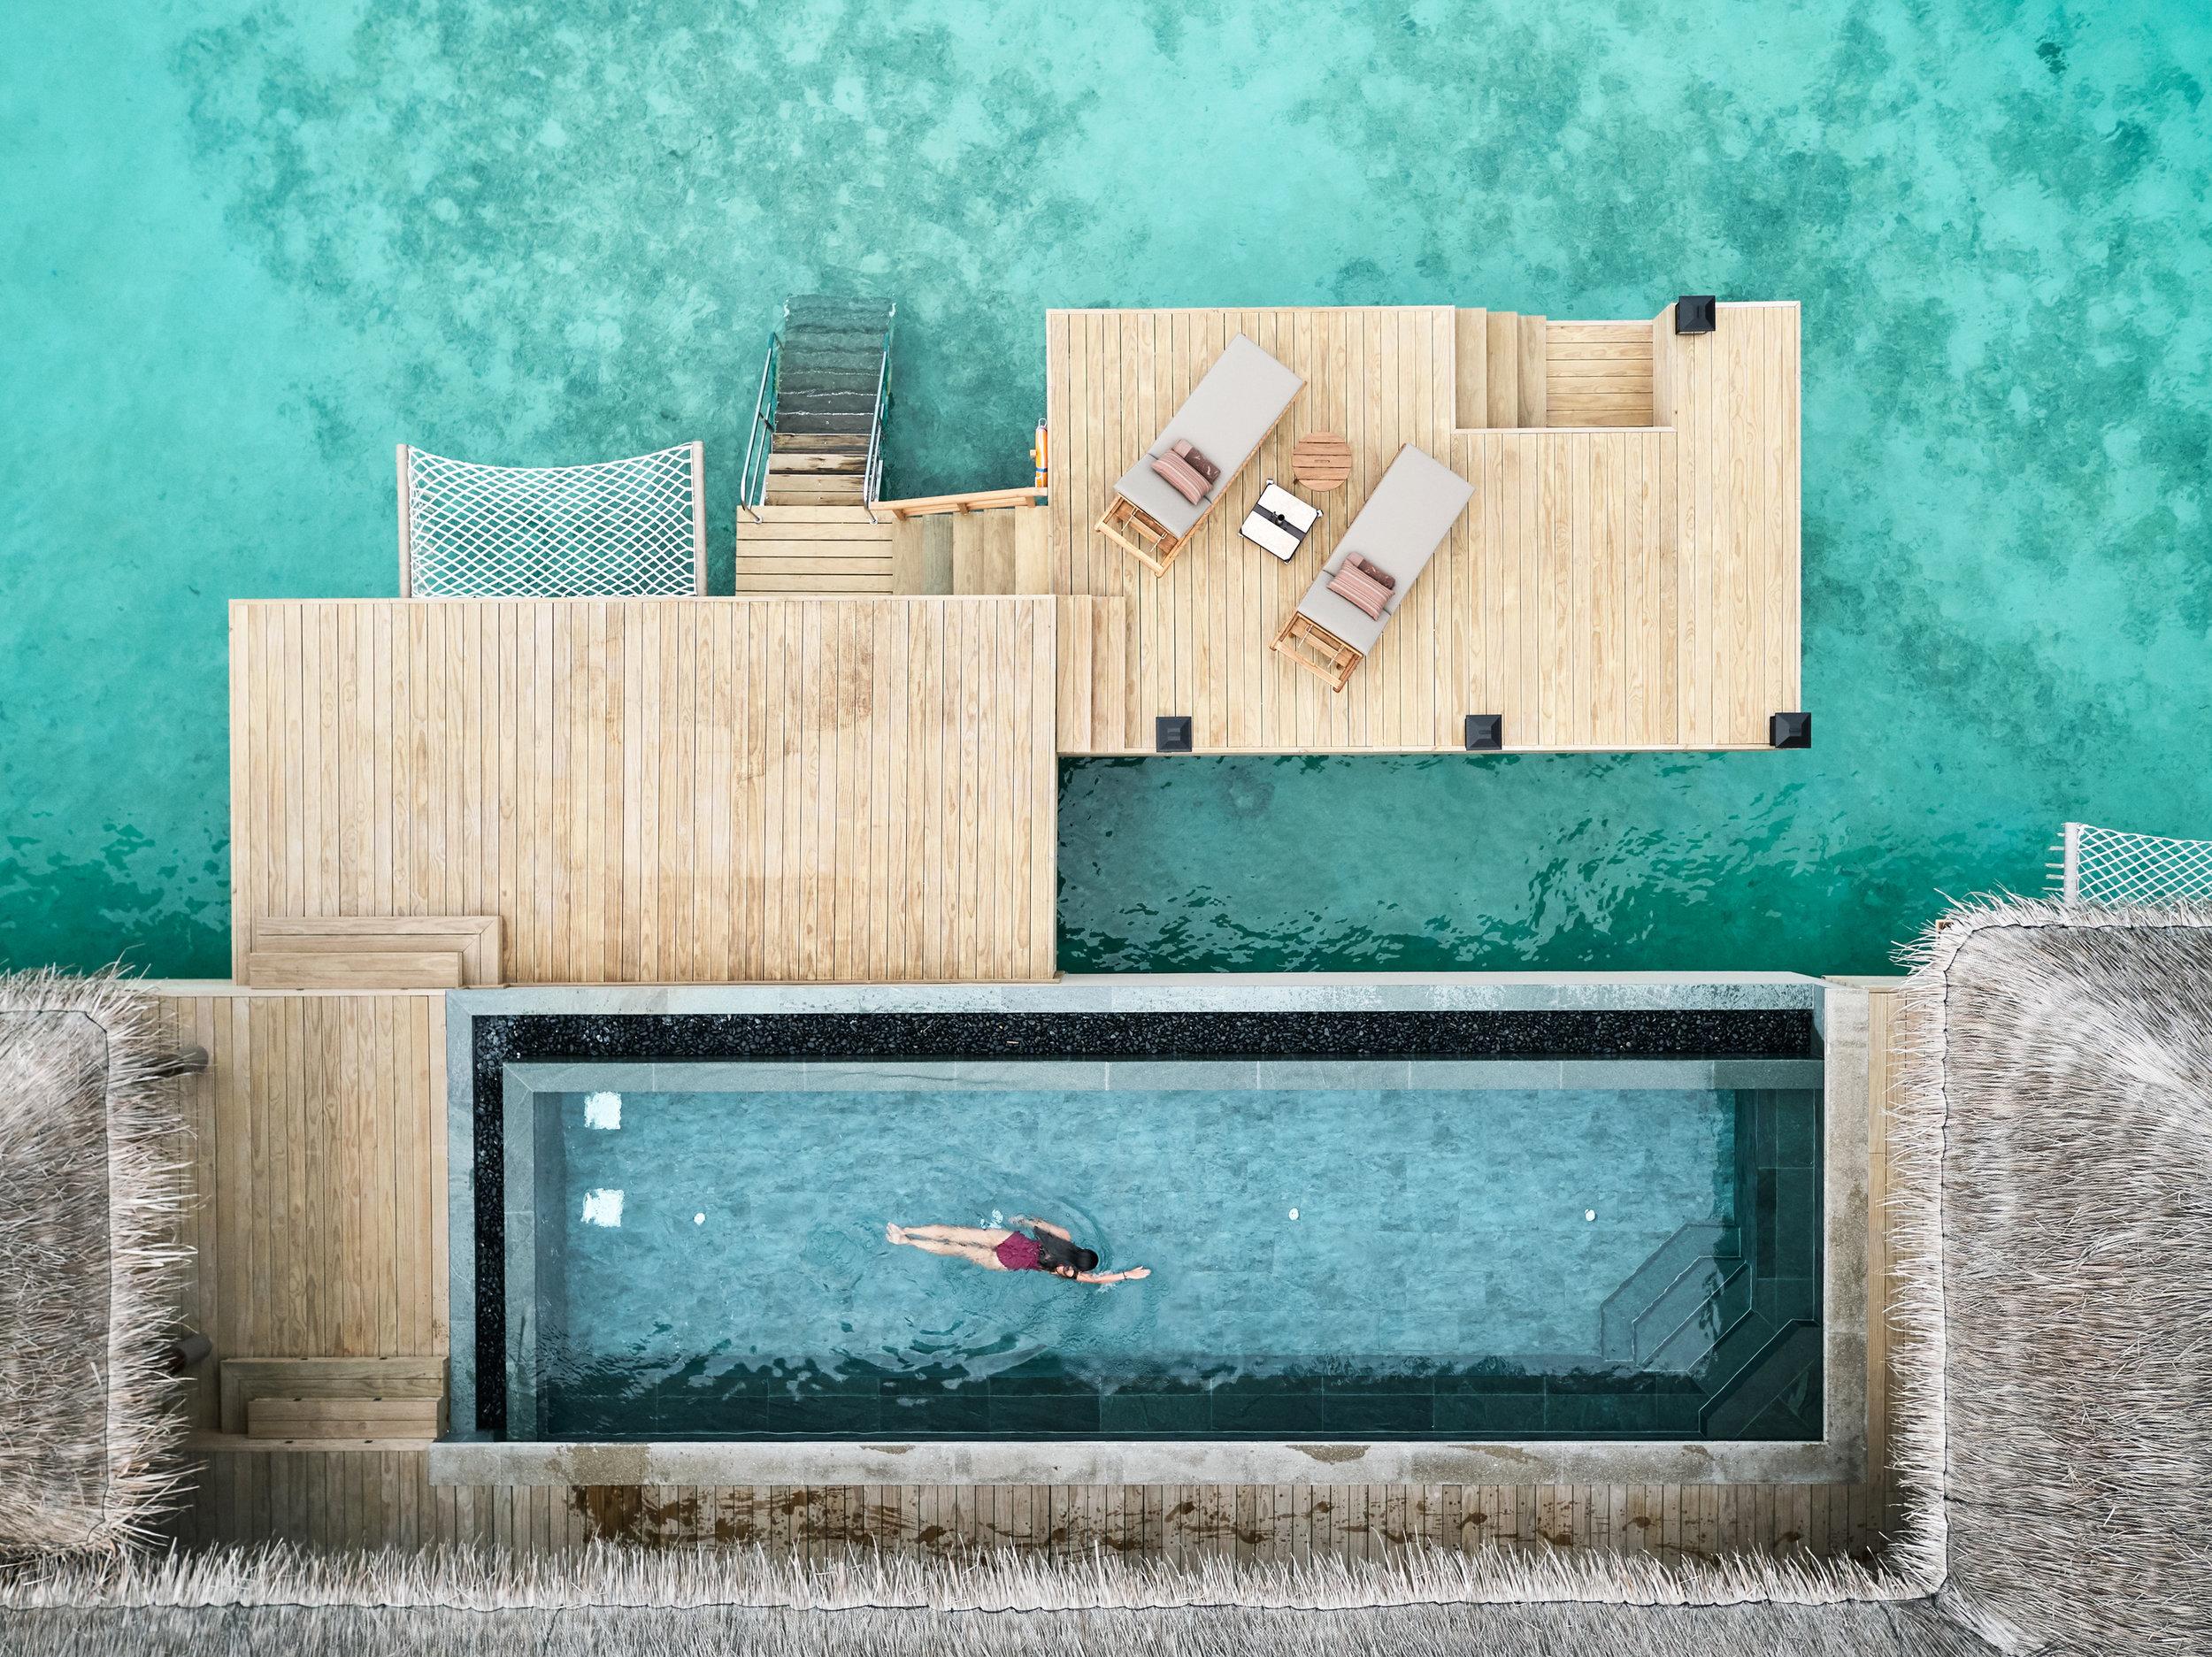 Three Bedroom Ocean Residence with 2 Pools_Deck with Swimming pool.jpg